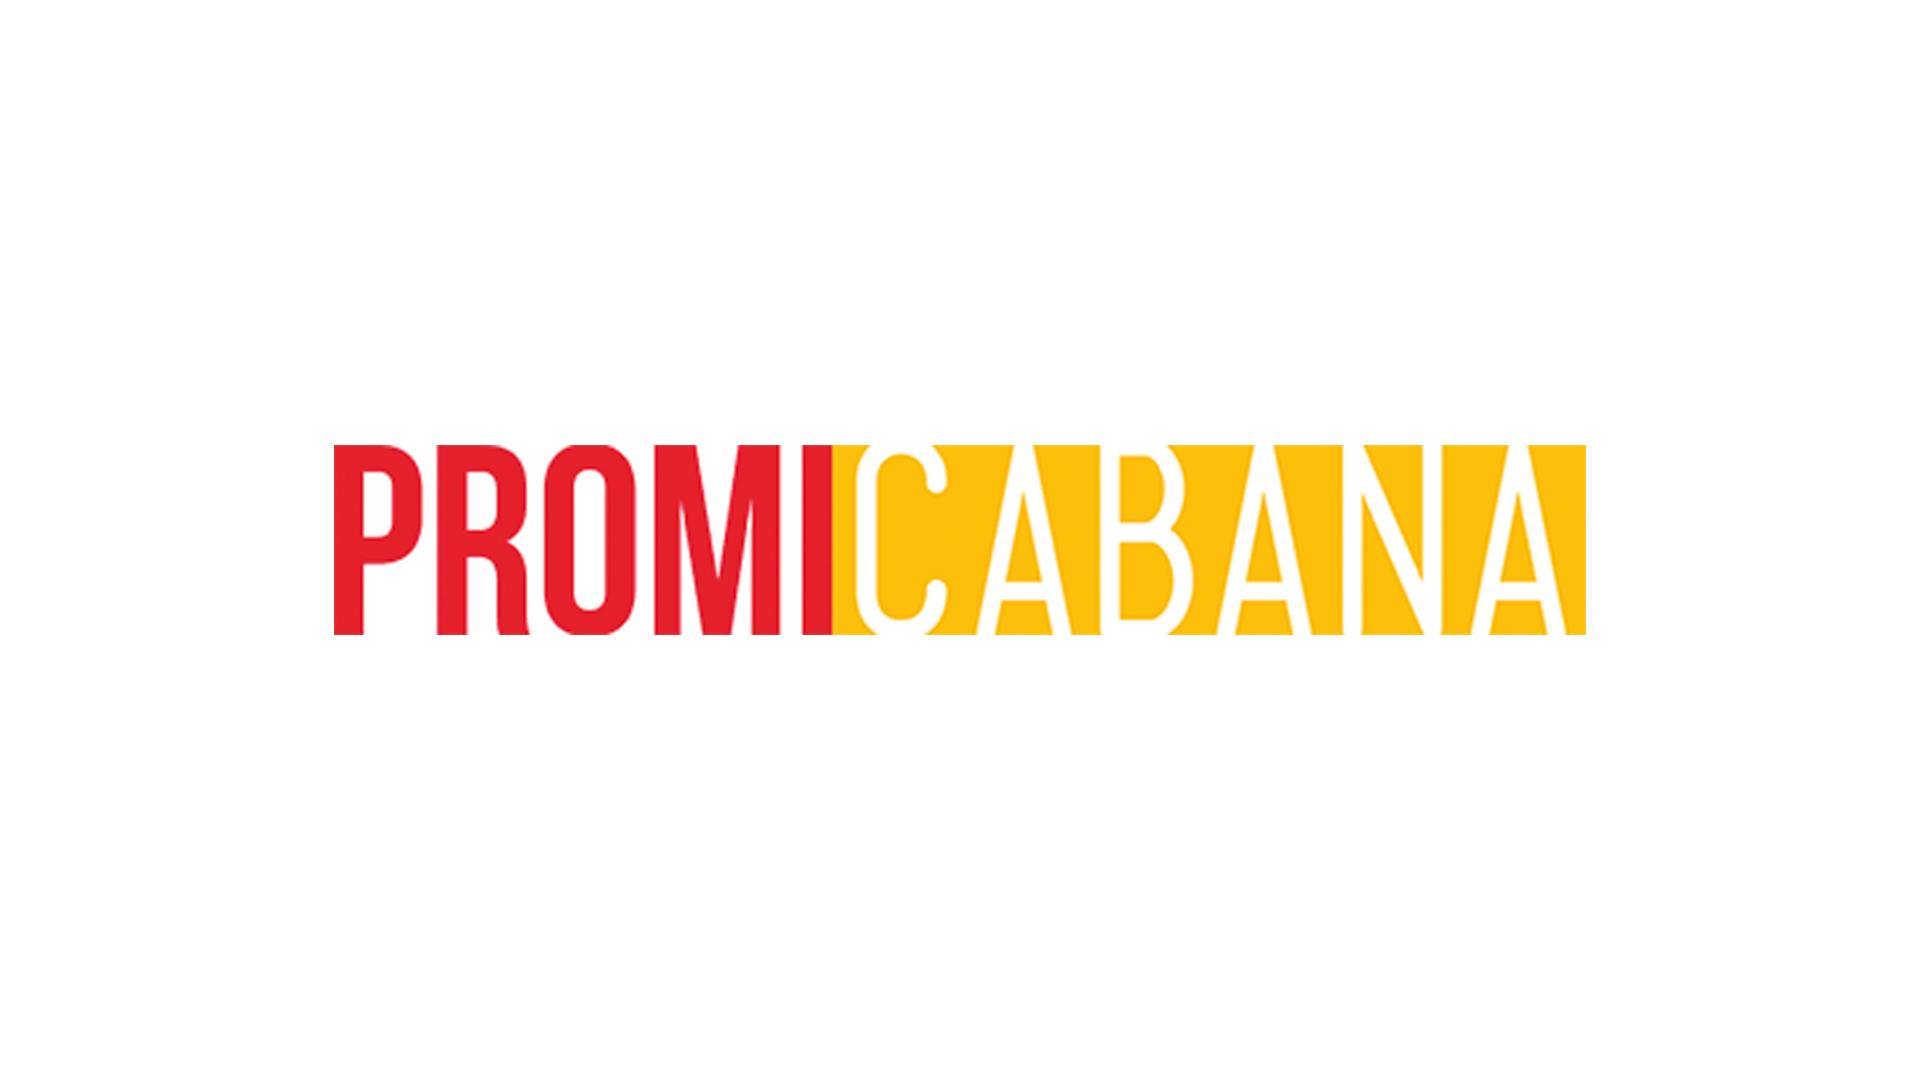 Bibi Dagi Bee Versöhnung Der Youtube Stars Promicabana